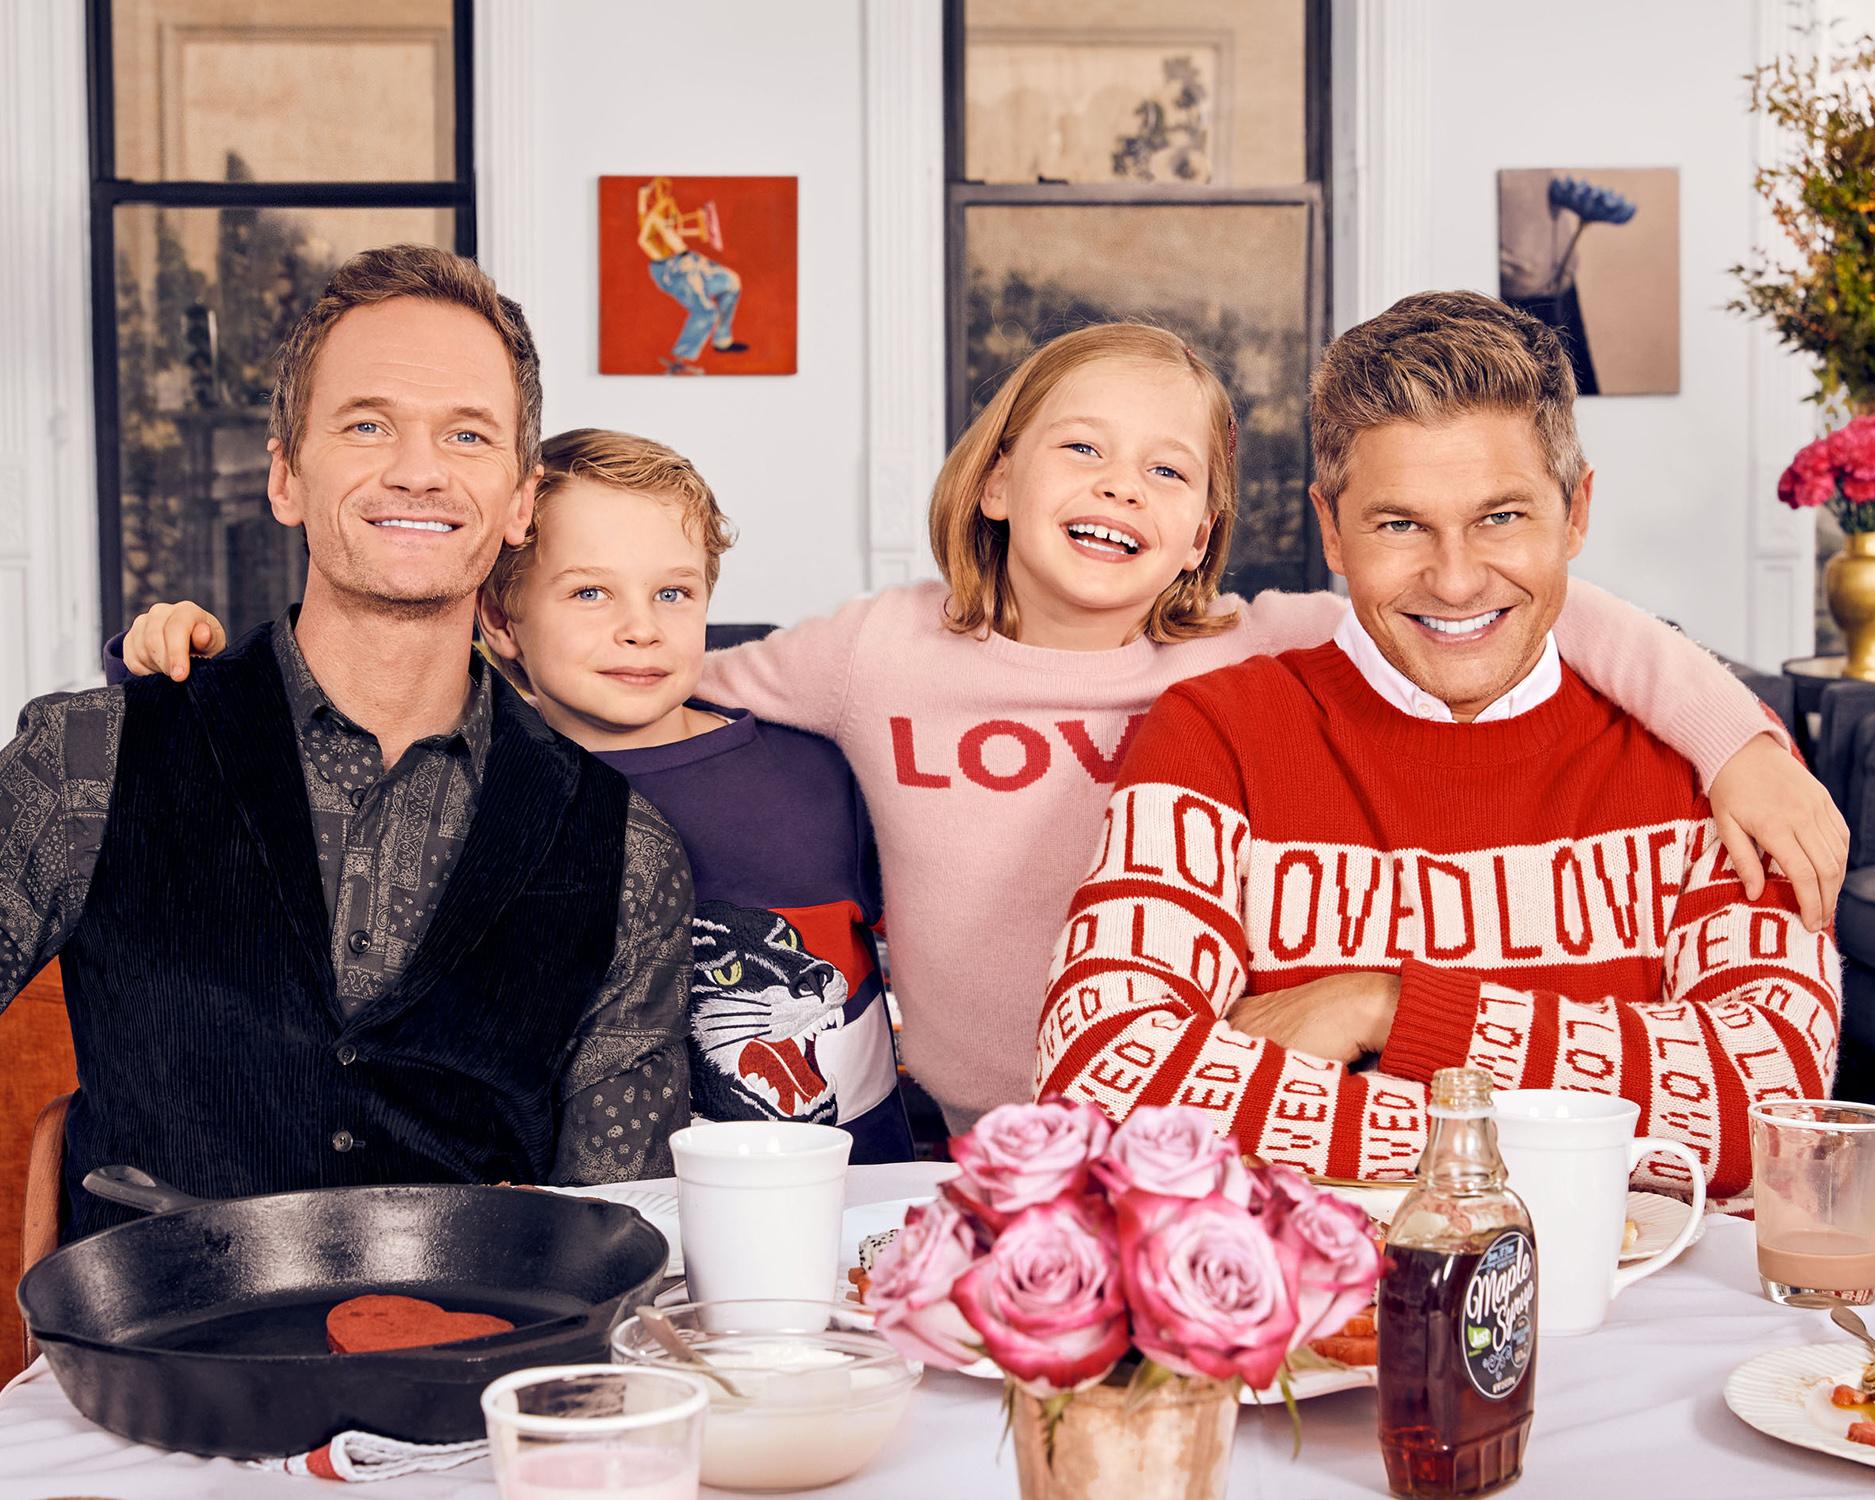 Neil Patrick Harris, David Burtka, and family